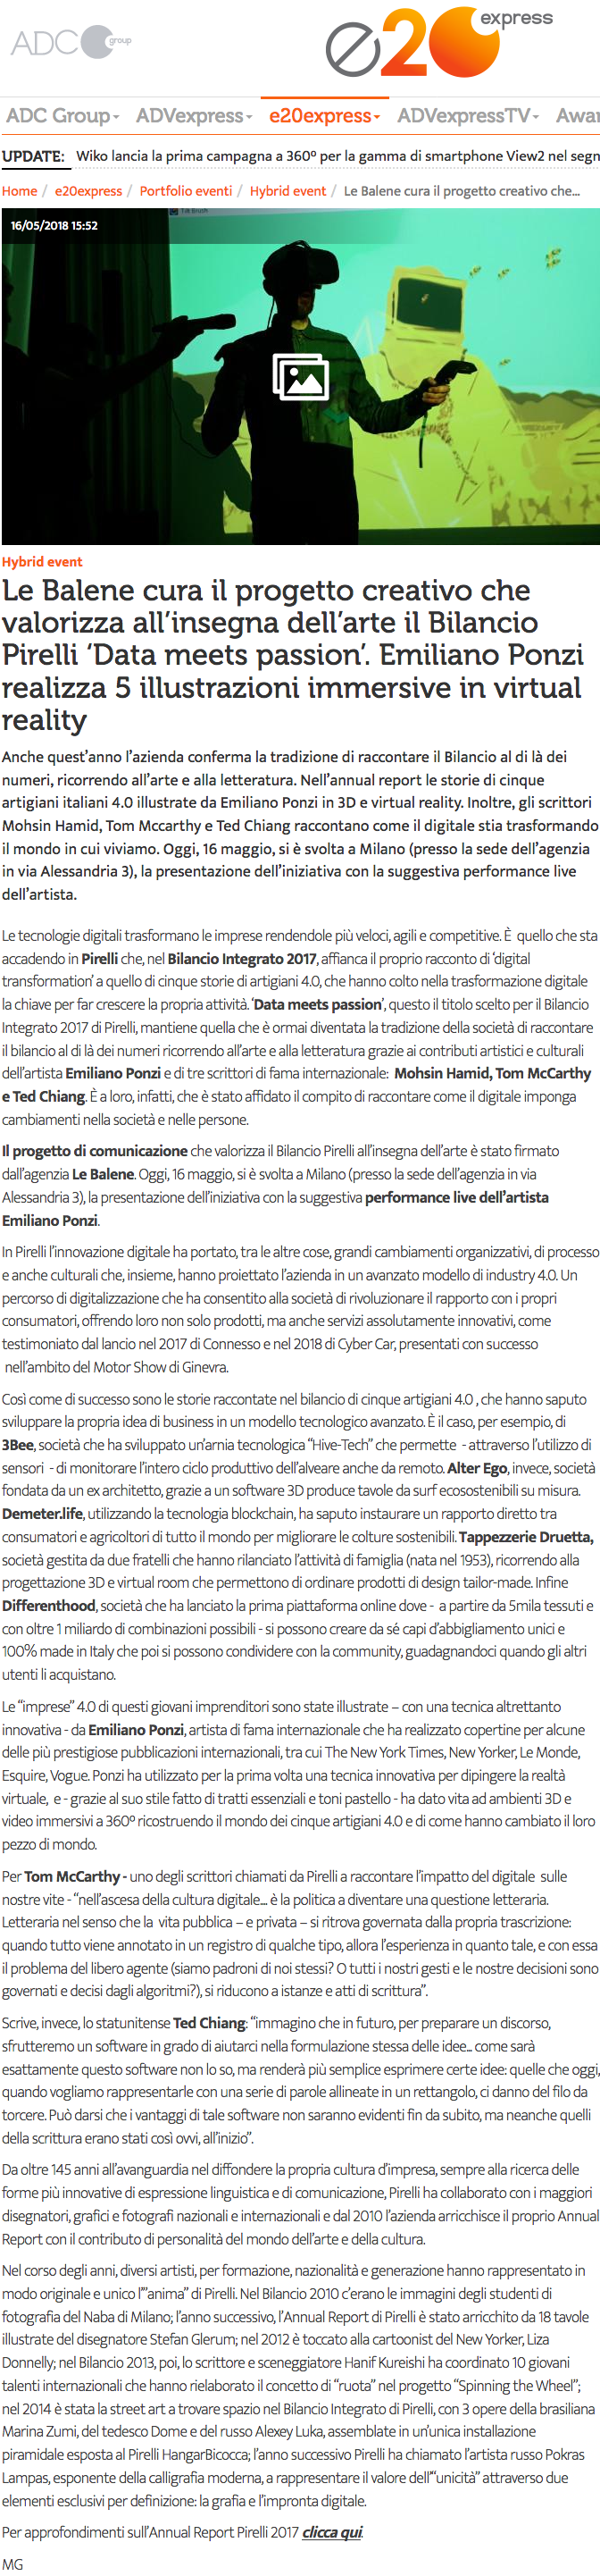 ADC Group Pirelli Emiliano Ponzi